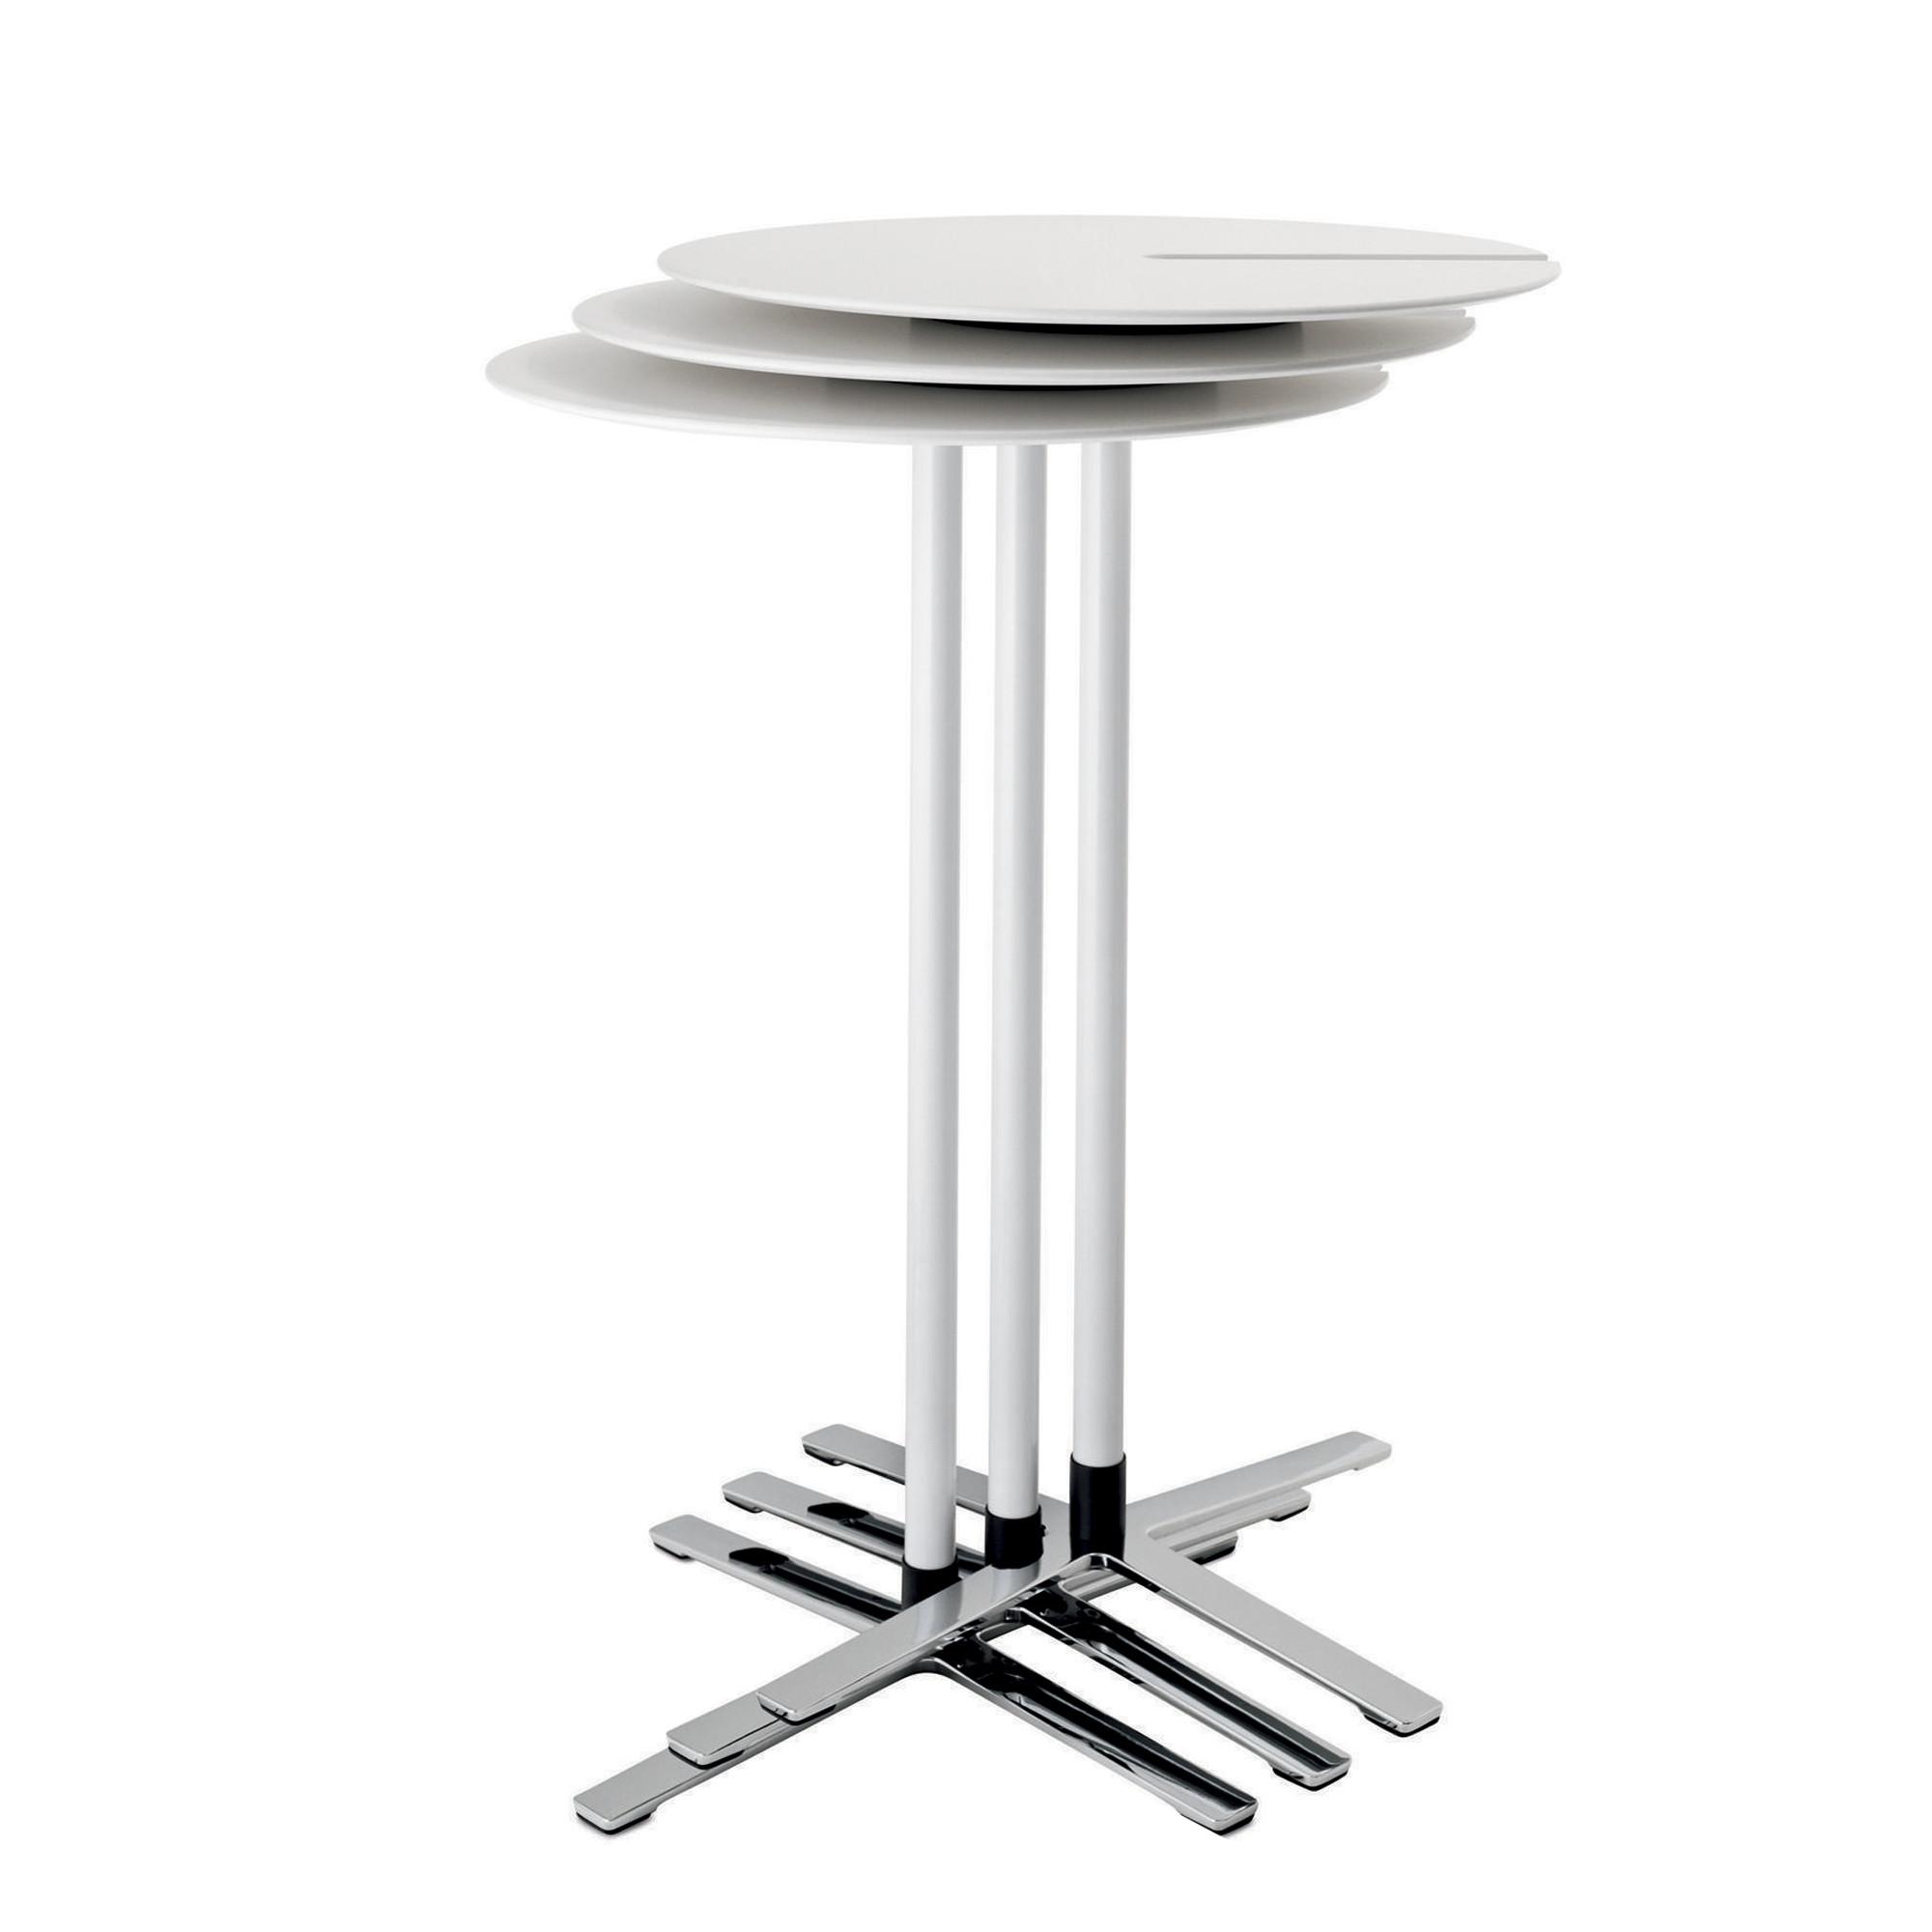 Aline Stackable Tables